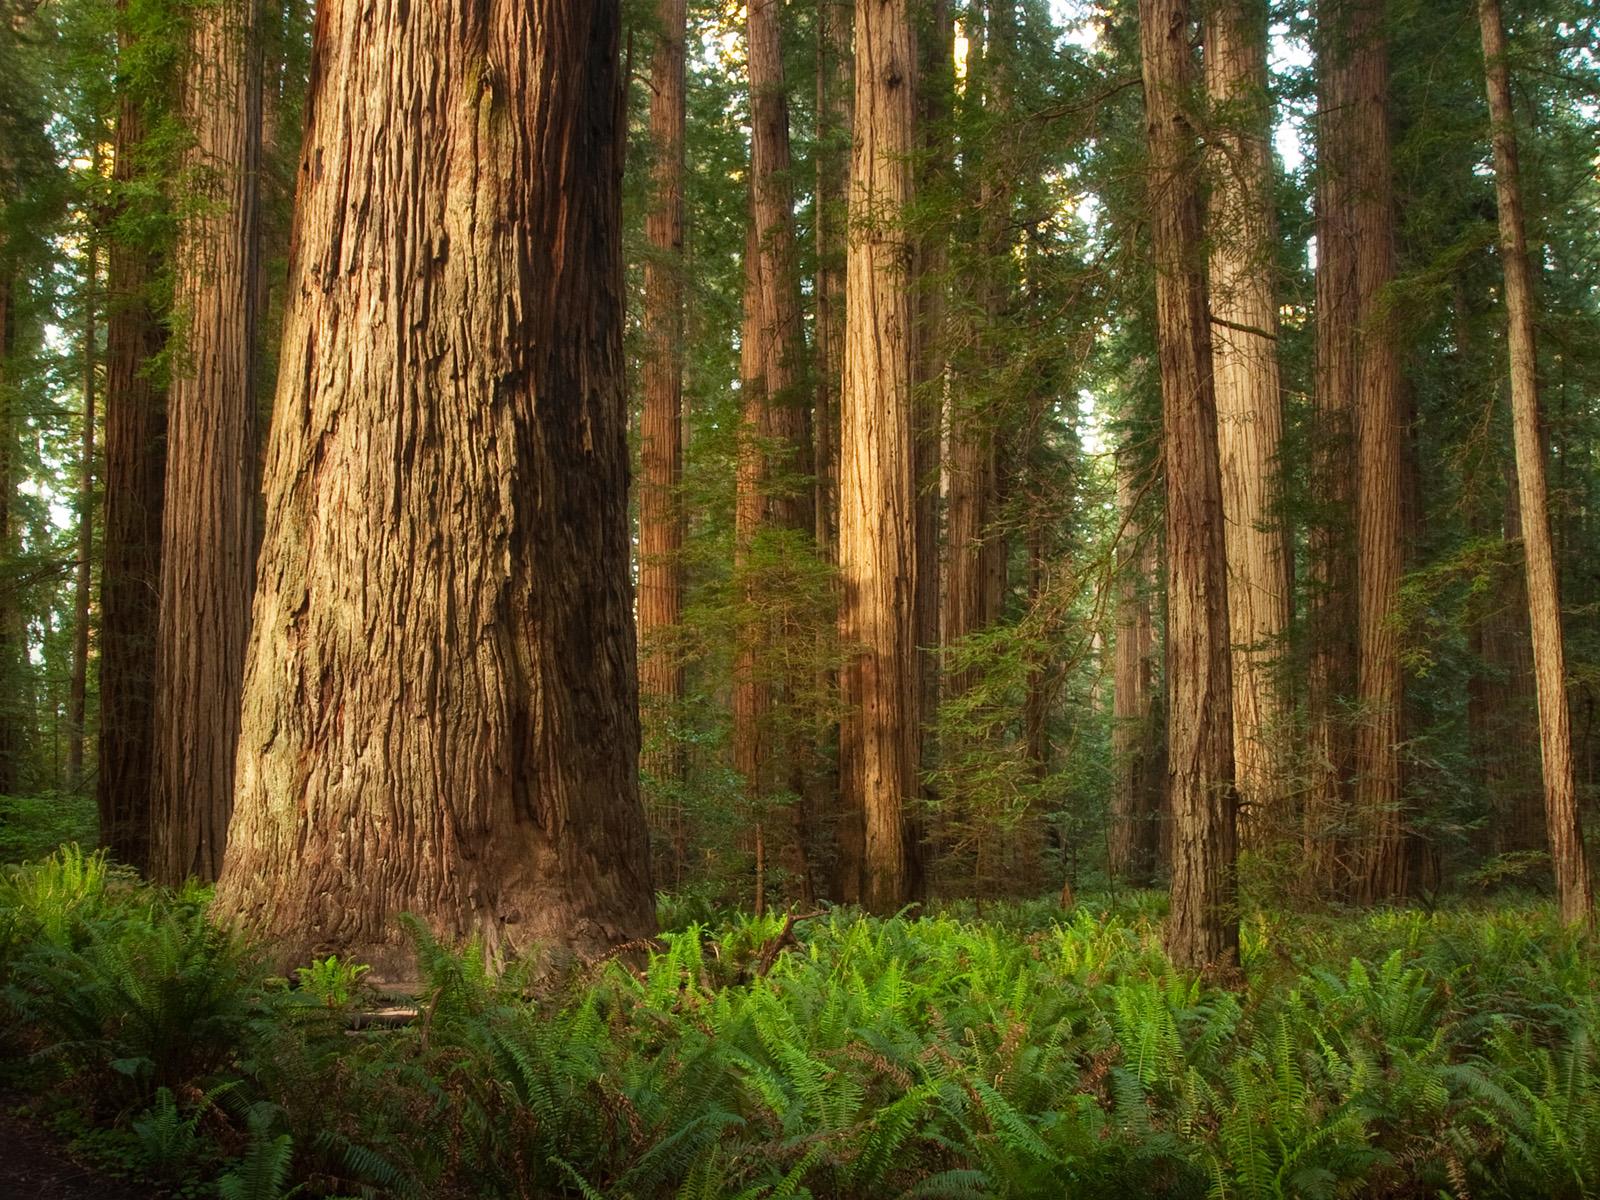 i-delightful-redwoods-in-california-near-san-francisco-redwoods-in-california-coast-redwoods-in-california-close-to-san-francisco-redwoods-in-california-near-san-francisco-redwoods-in-california.jpeg